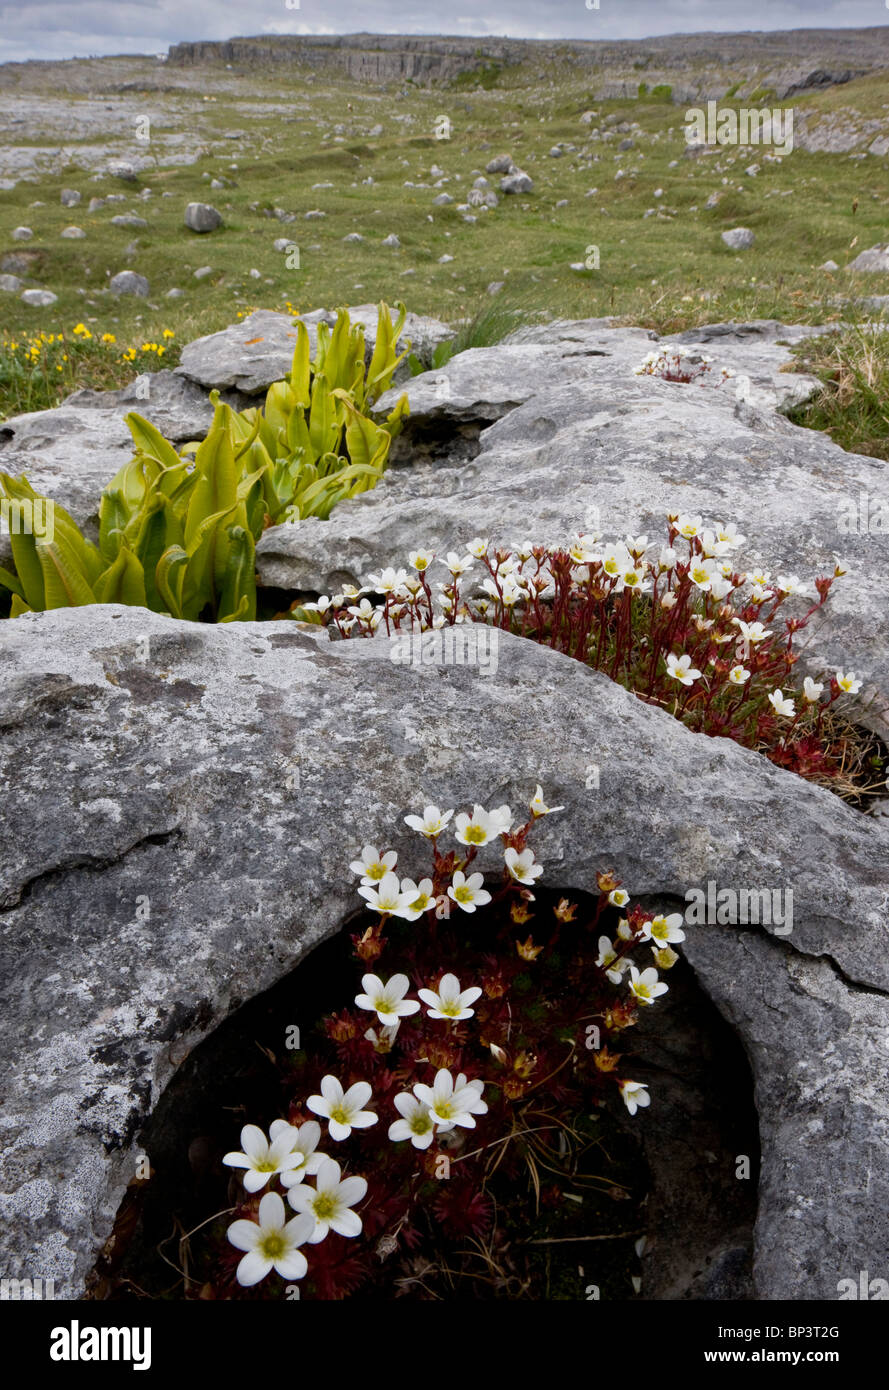 Irish Saxifrage, Saxifraga rosacea ssp. rosacea on limestone pavement, with Hart's Tongue Fern; The Burren, - Stock Image